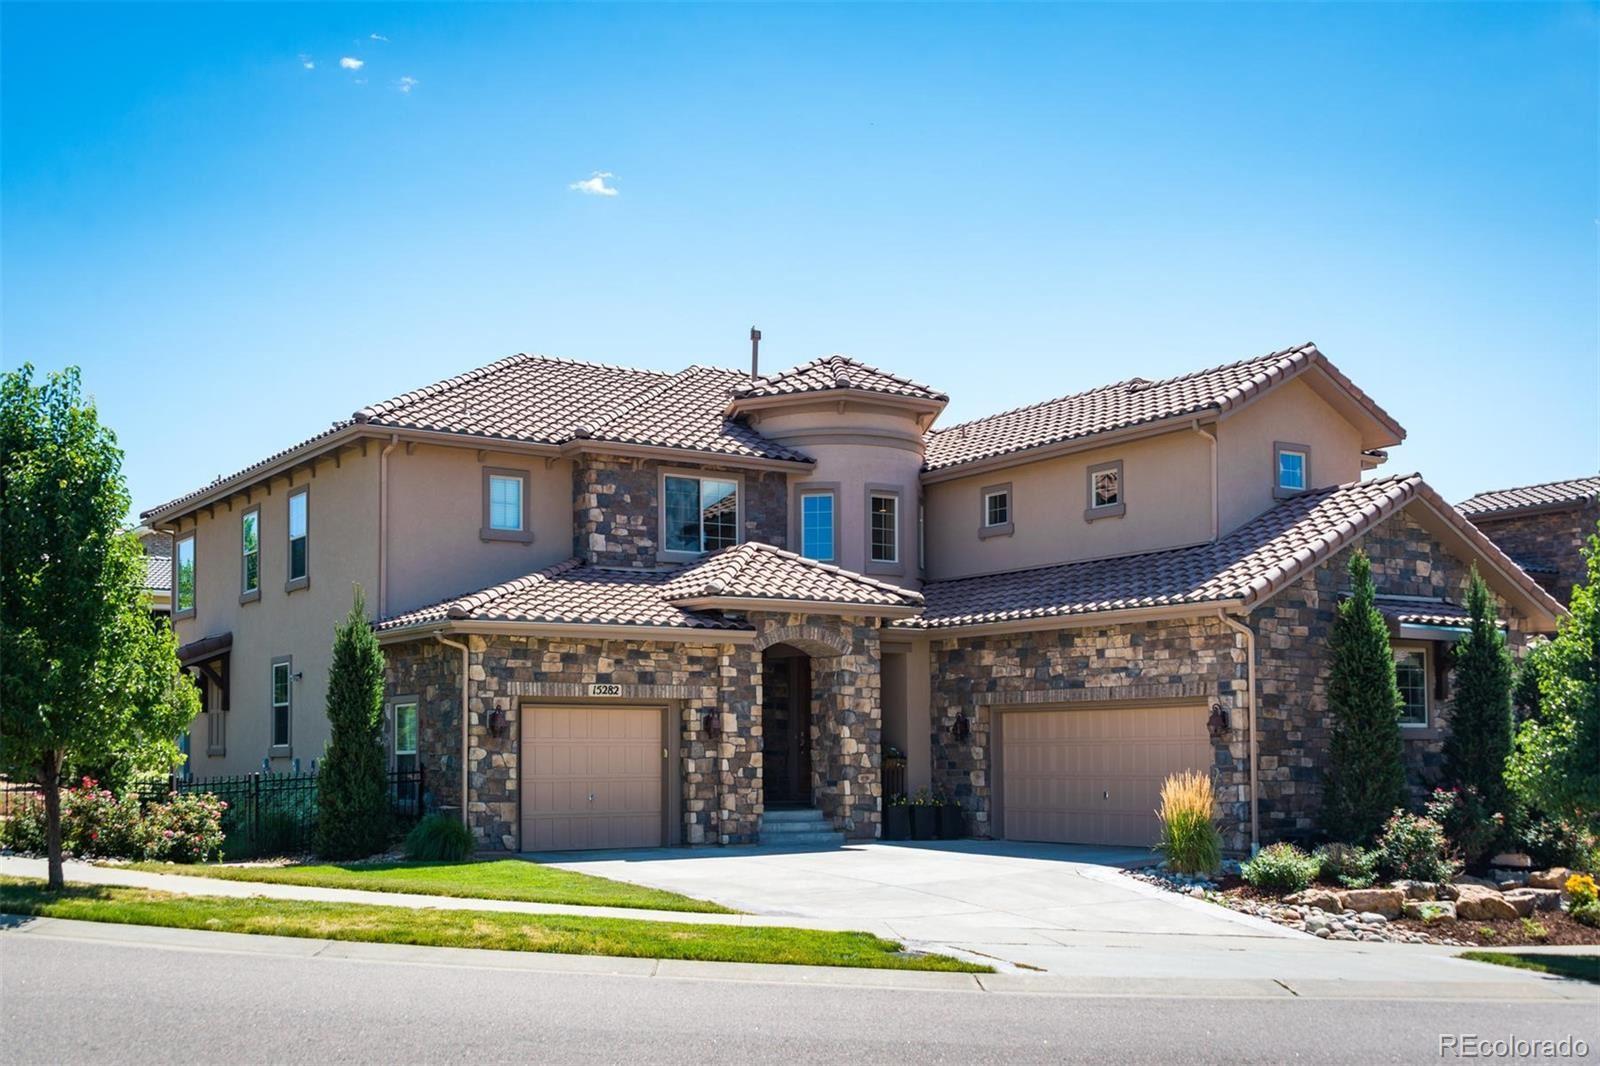 15282 W Warren Drive, Lakewood, CO 80228 - #: 8456832